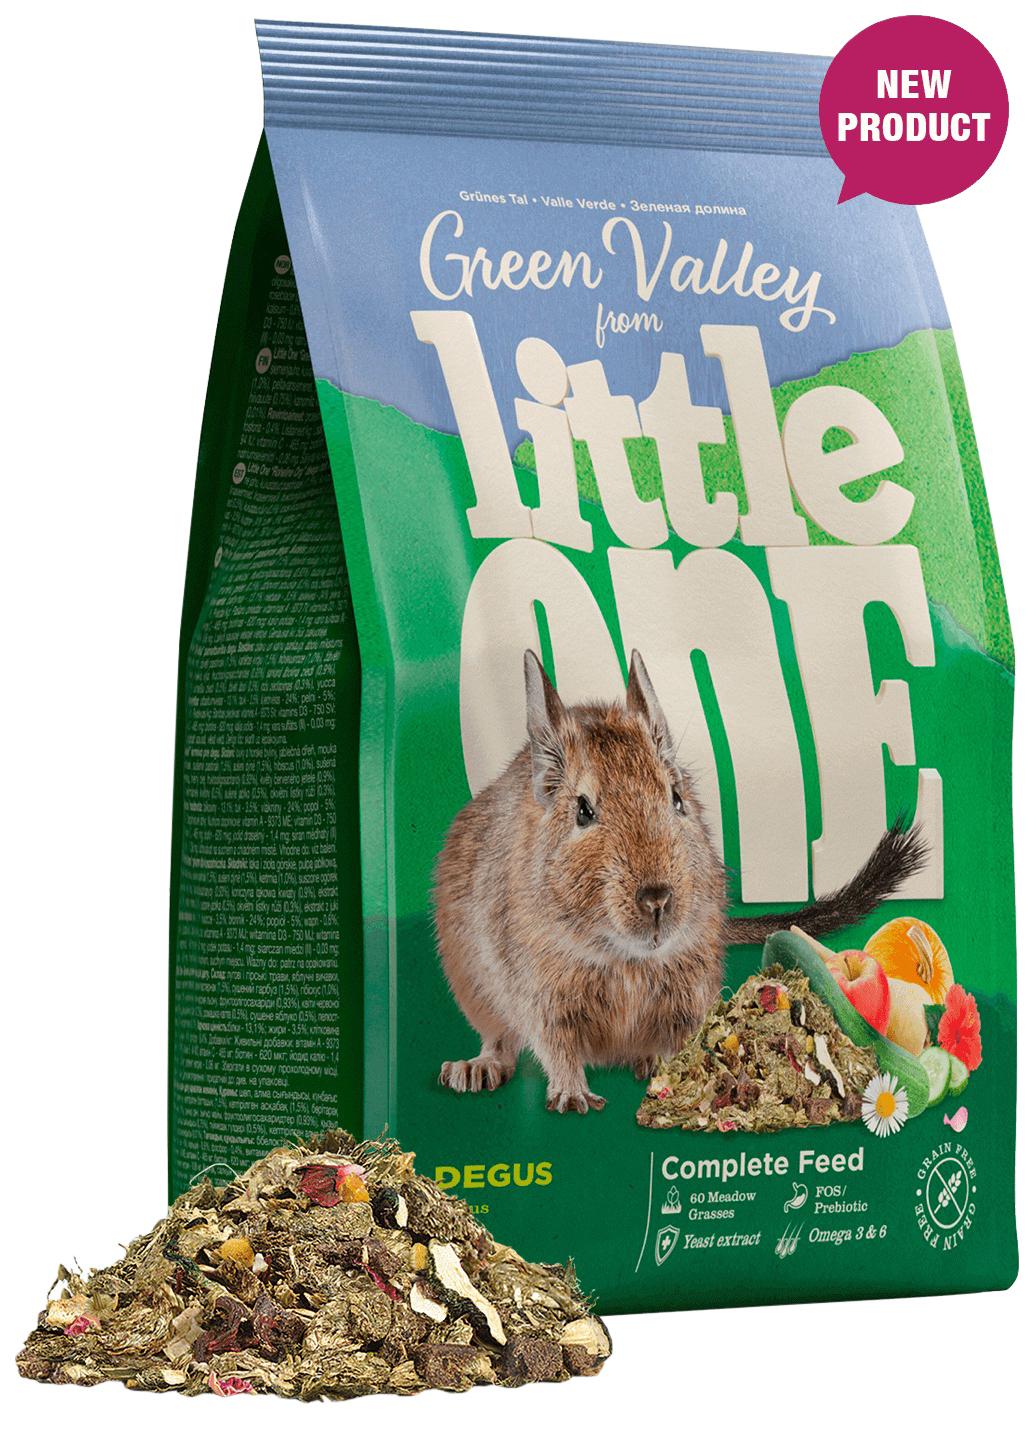 Корм для дегу Little One Green Valley